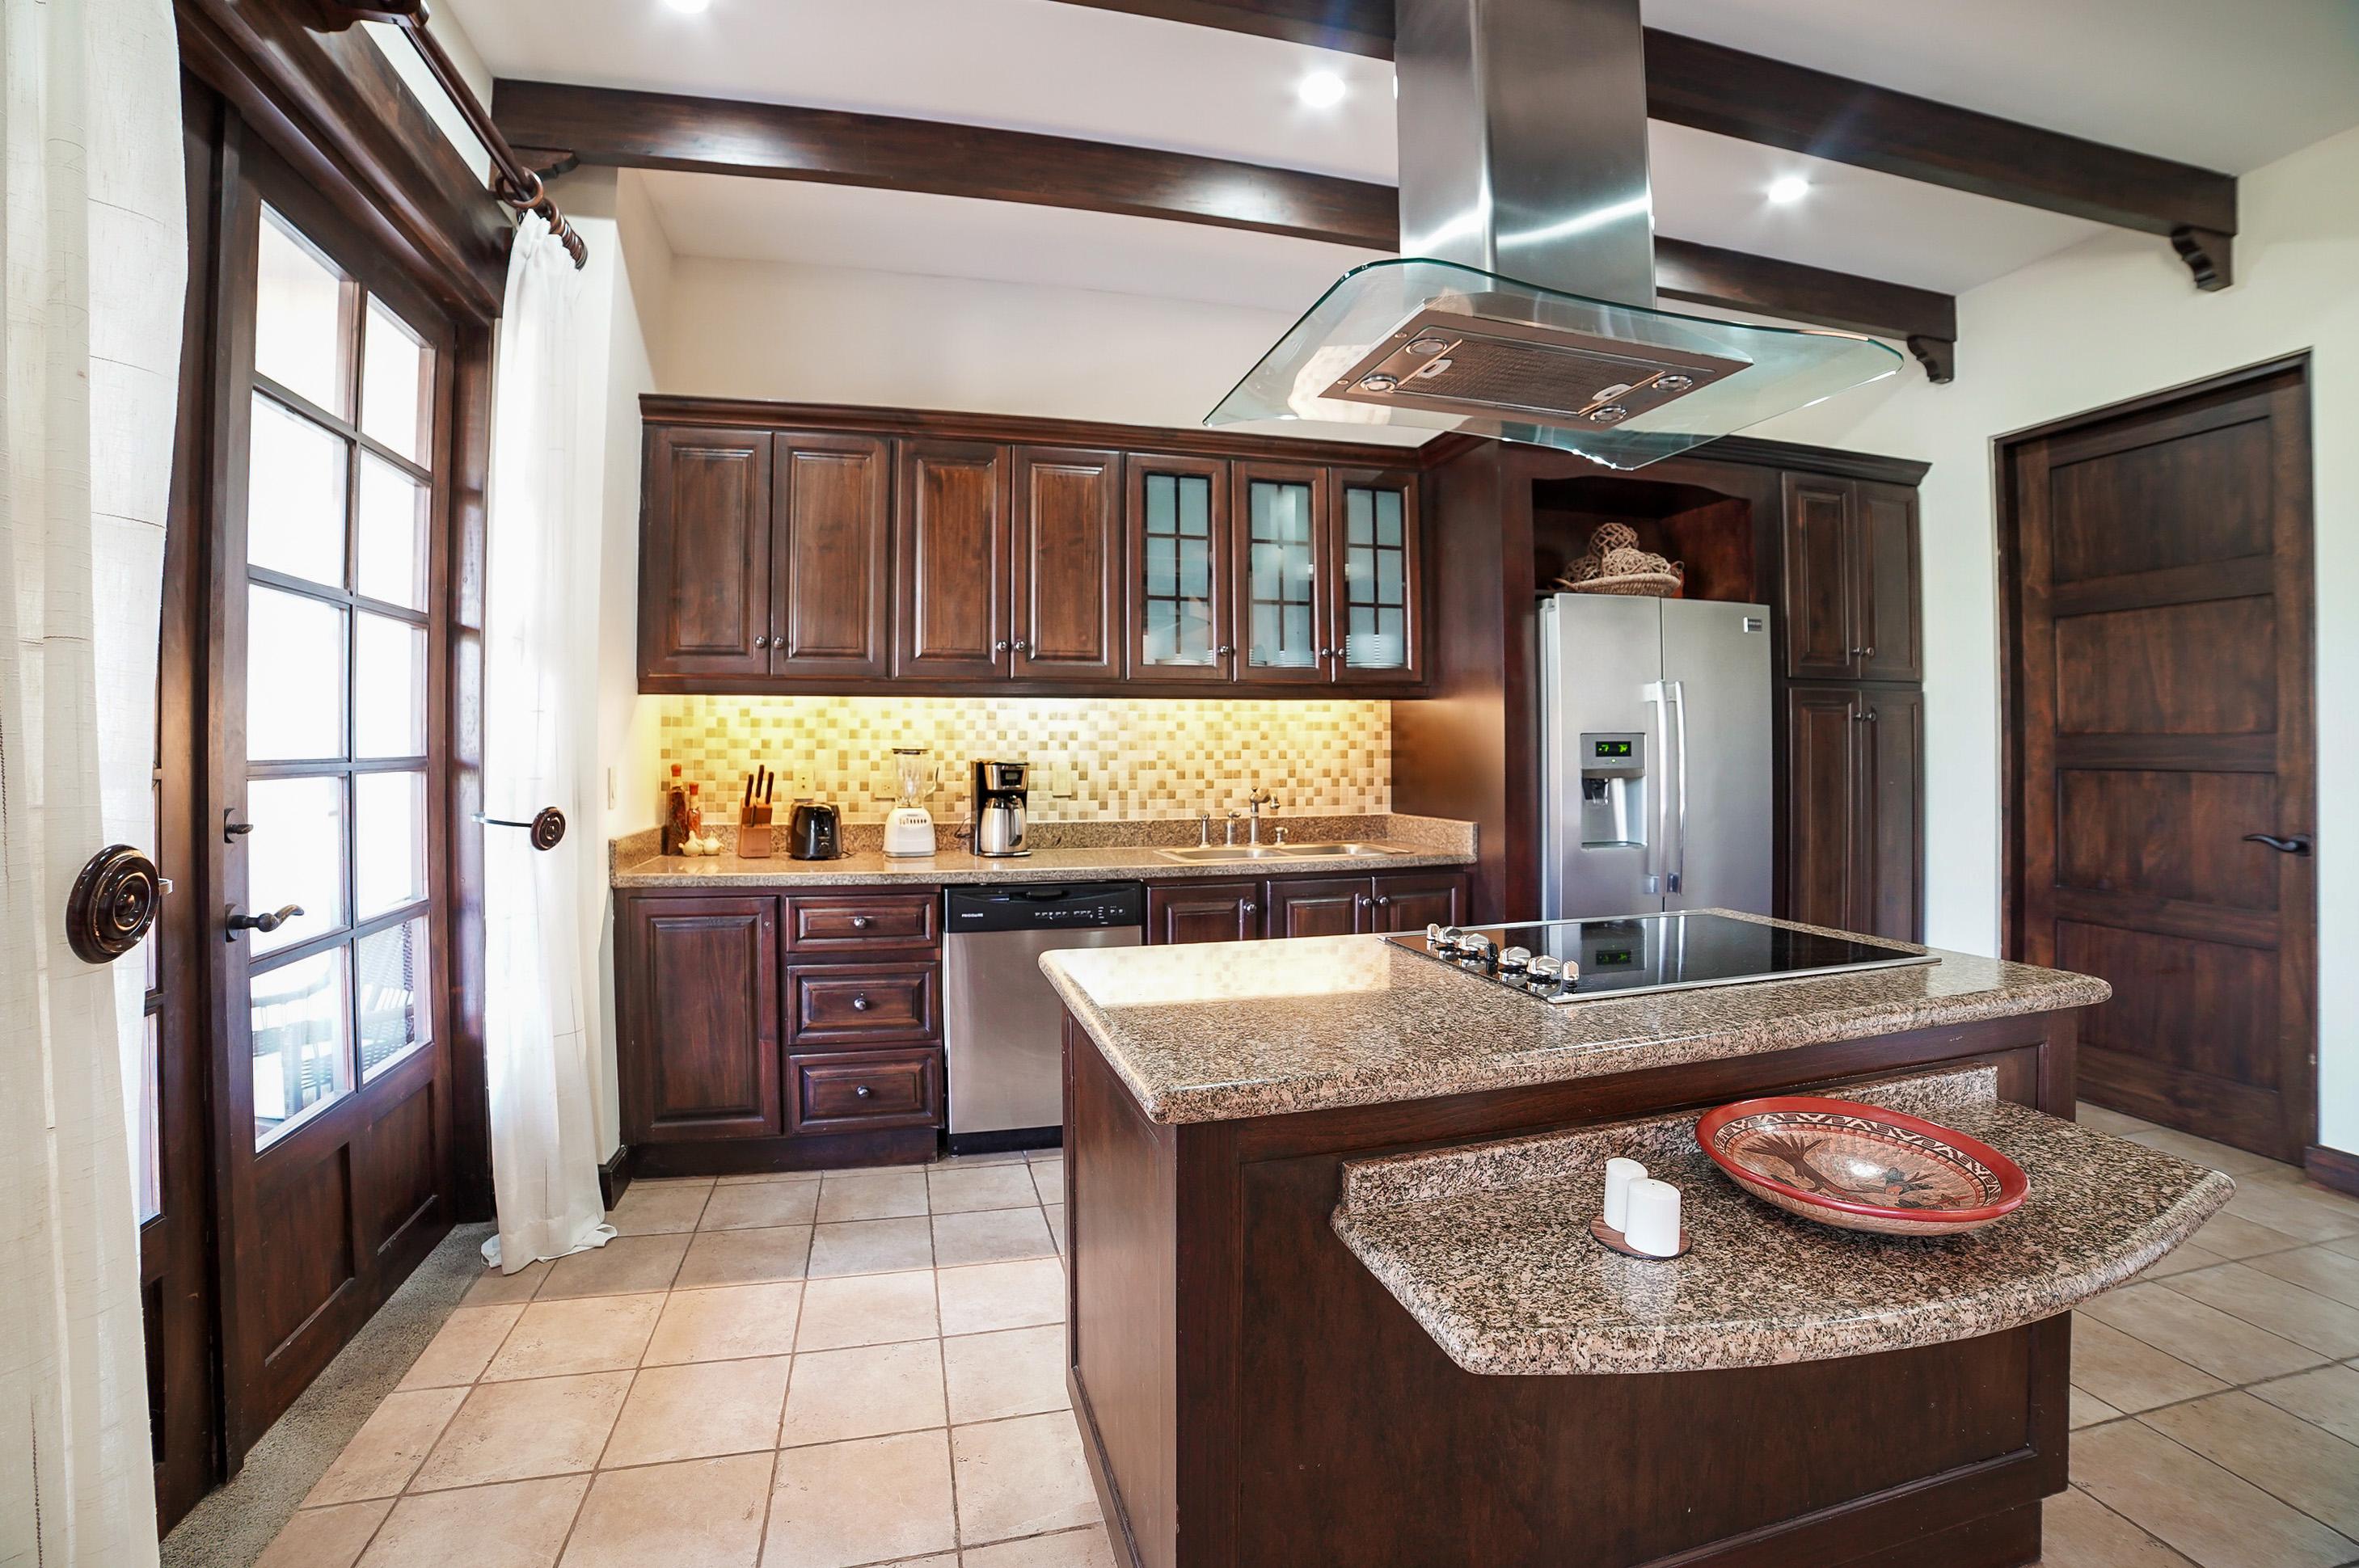 Full kitchen with breakfast bar